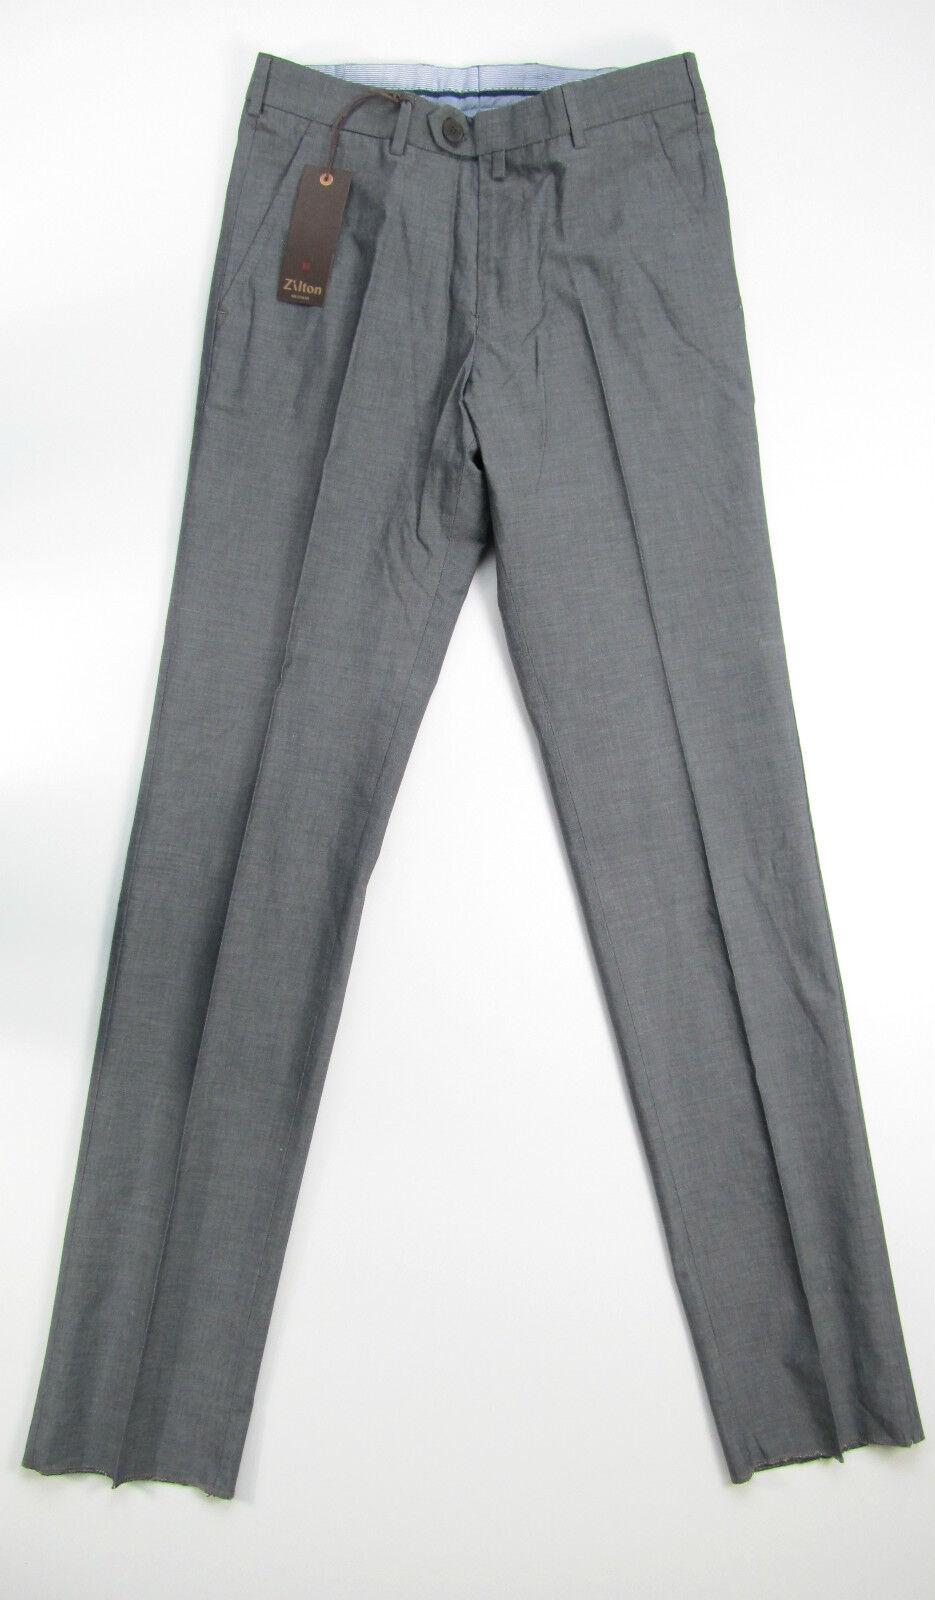 Zilton Pantalone Broek Hose Anzug grey Marcel 7391 47 Neu